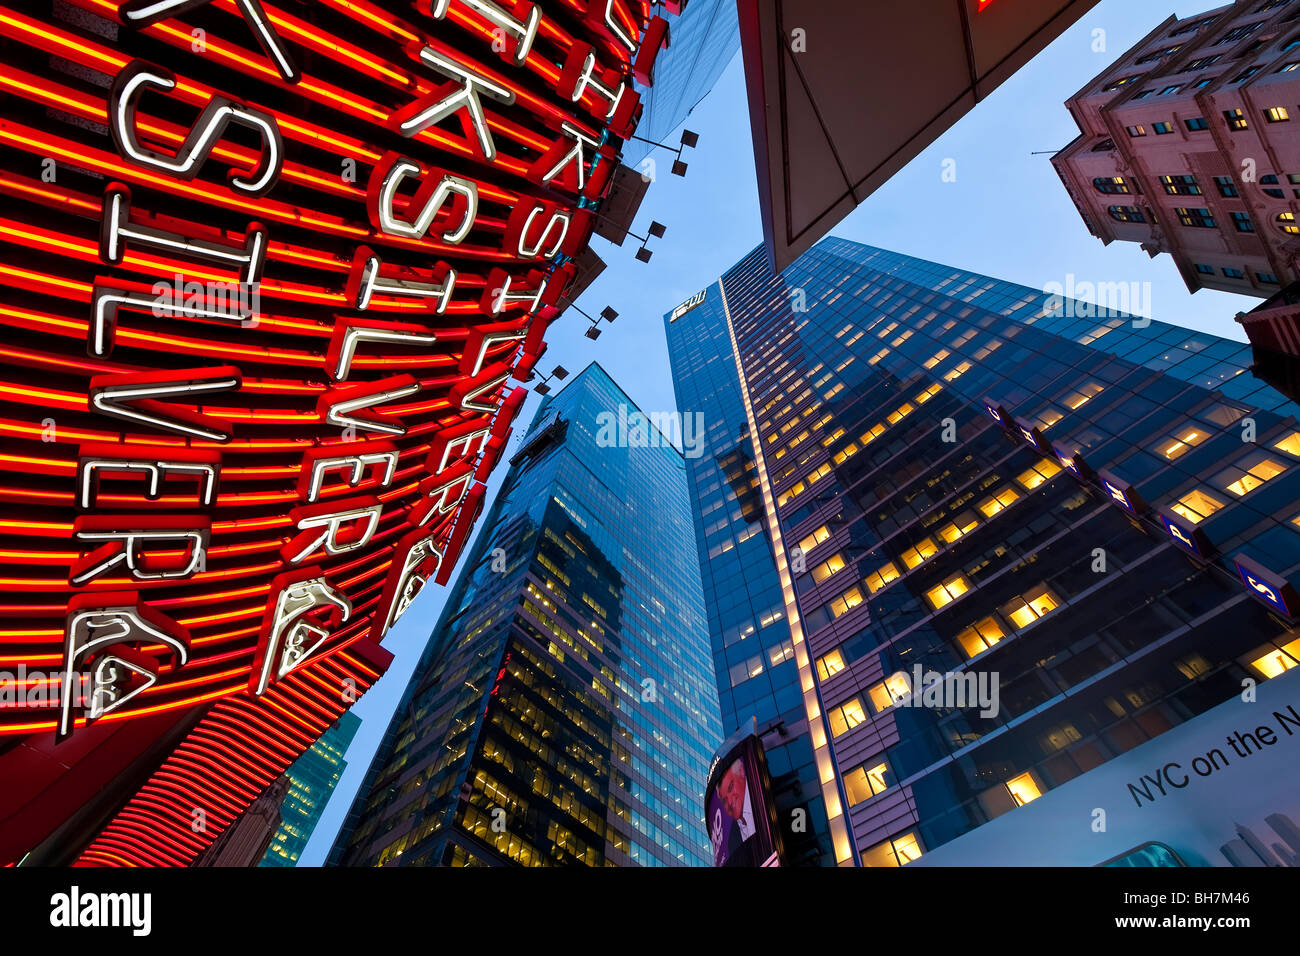 USA, New York City, Manhattan, Times Square, Neon lights of 42nd Street - Stock Image